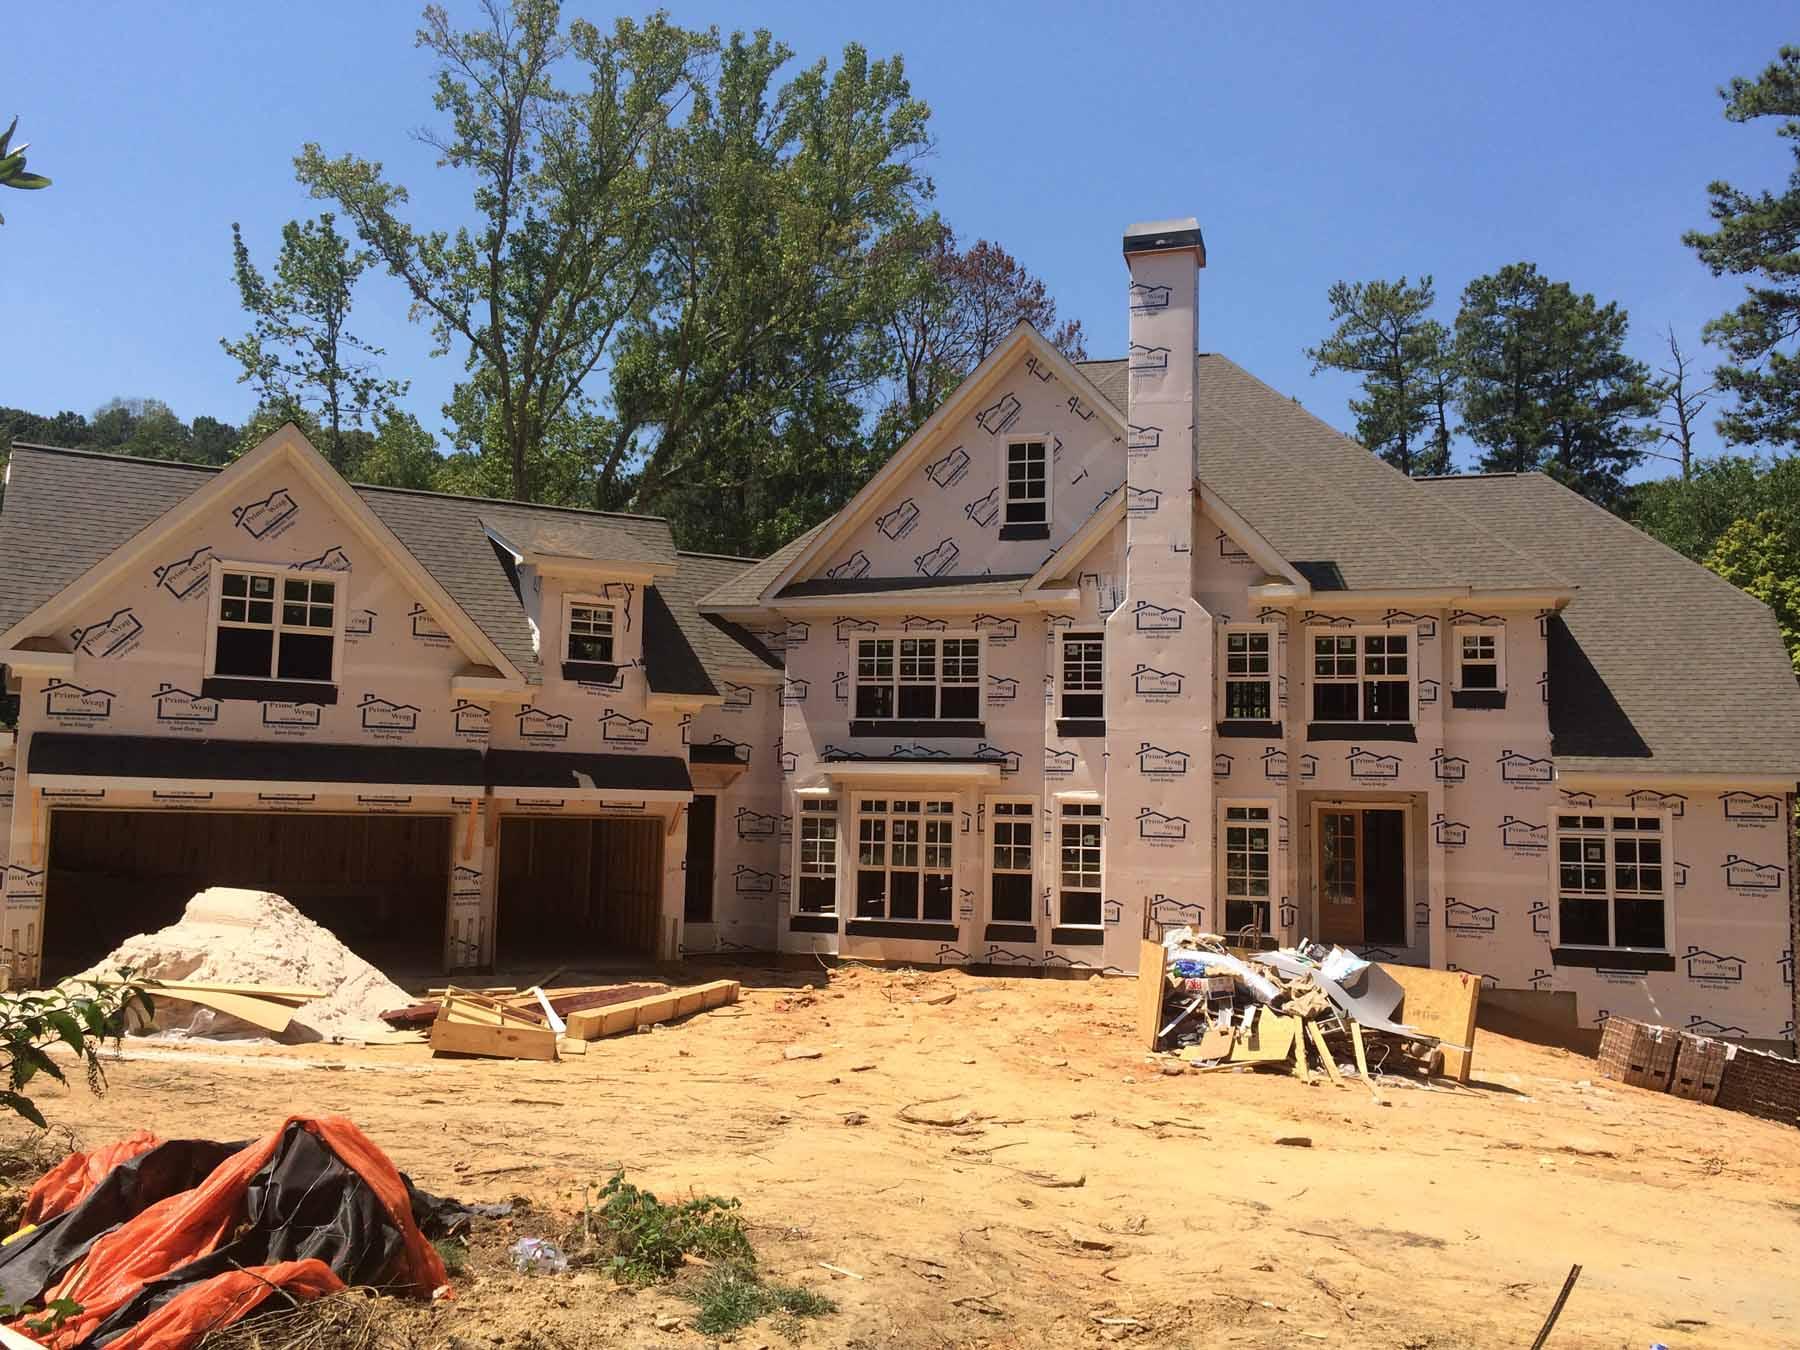 独户住宅 为 销售 在 New Construction in Chastain Buckhead 5136 Powers Ferry Road Sandy Springs, 乔治亚州 30327 美国